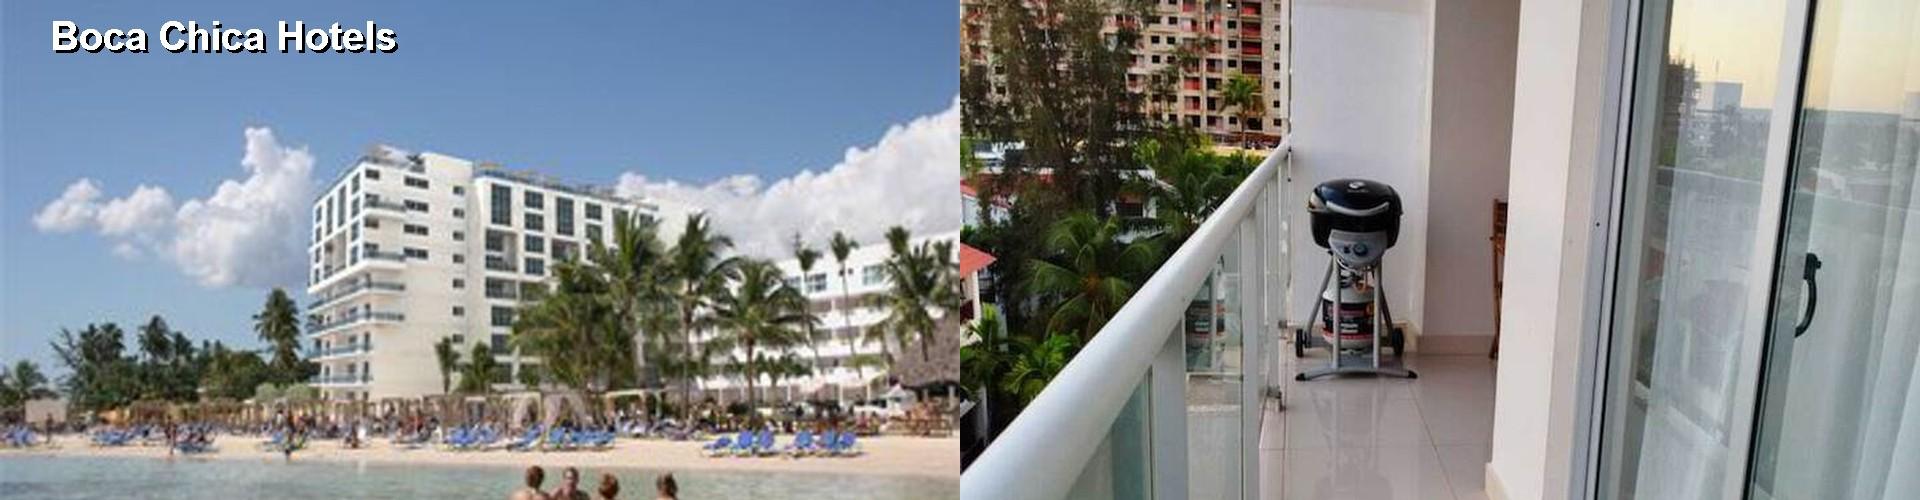 5 Best Hotels Near Boca Chica